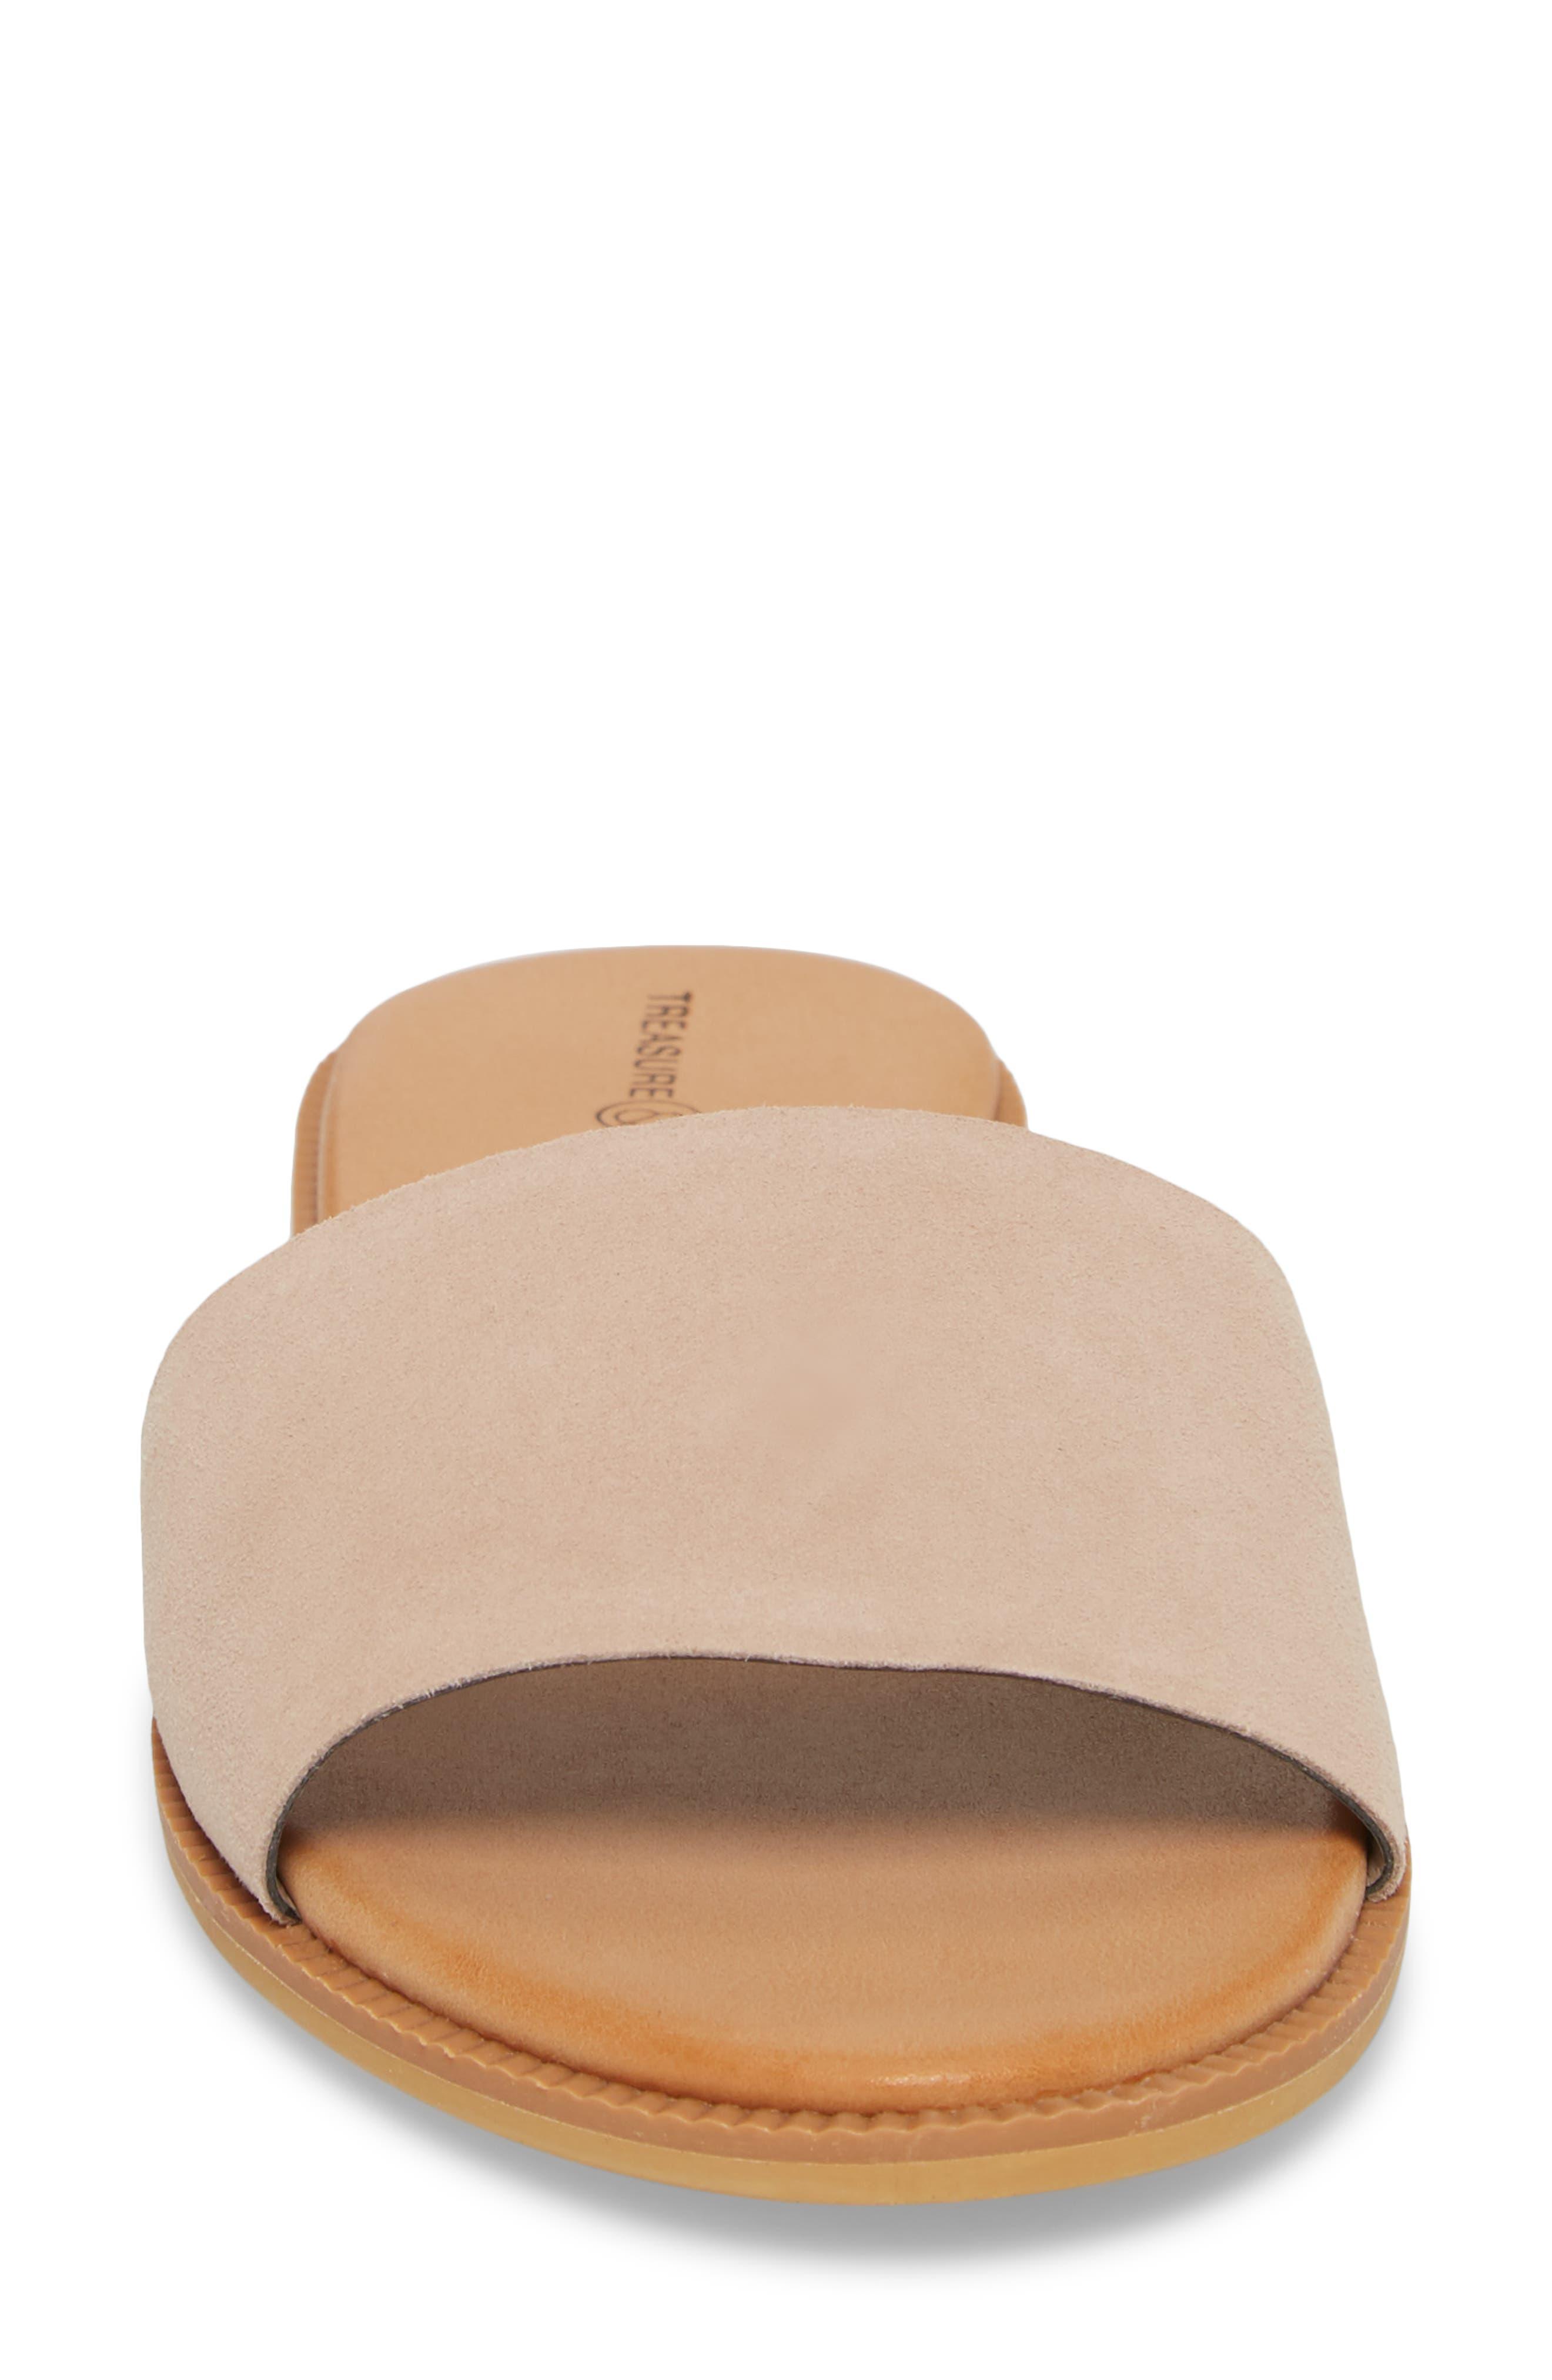 TREASURE & BOND, Mere Flat Slide Sandal, Alternate thumbnail 4, color, NEW BLUSH SUEDE